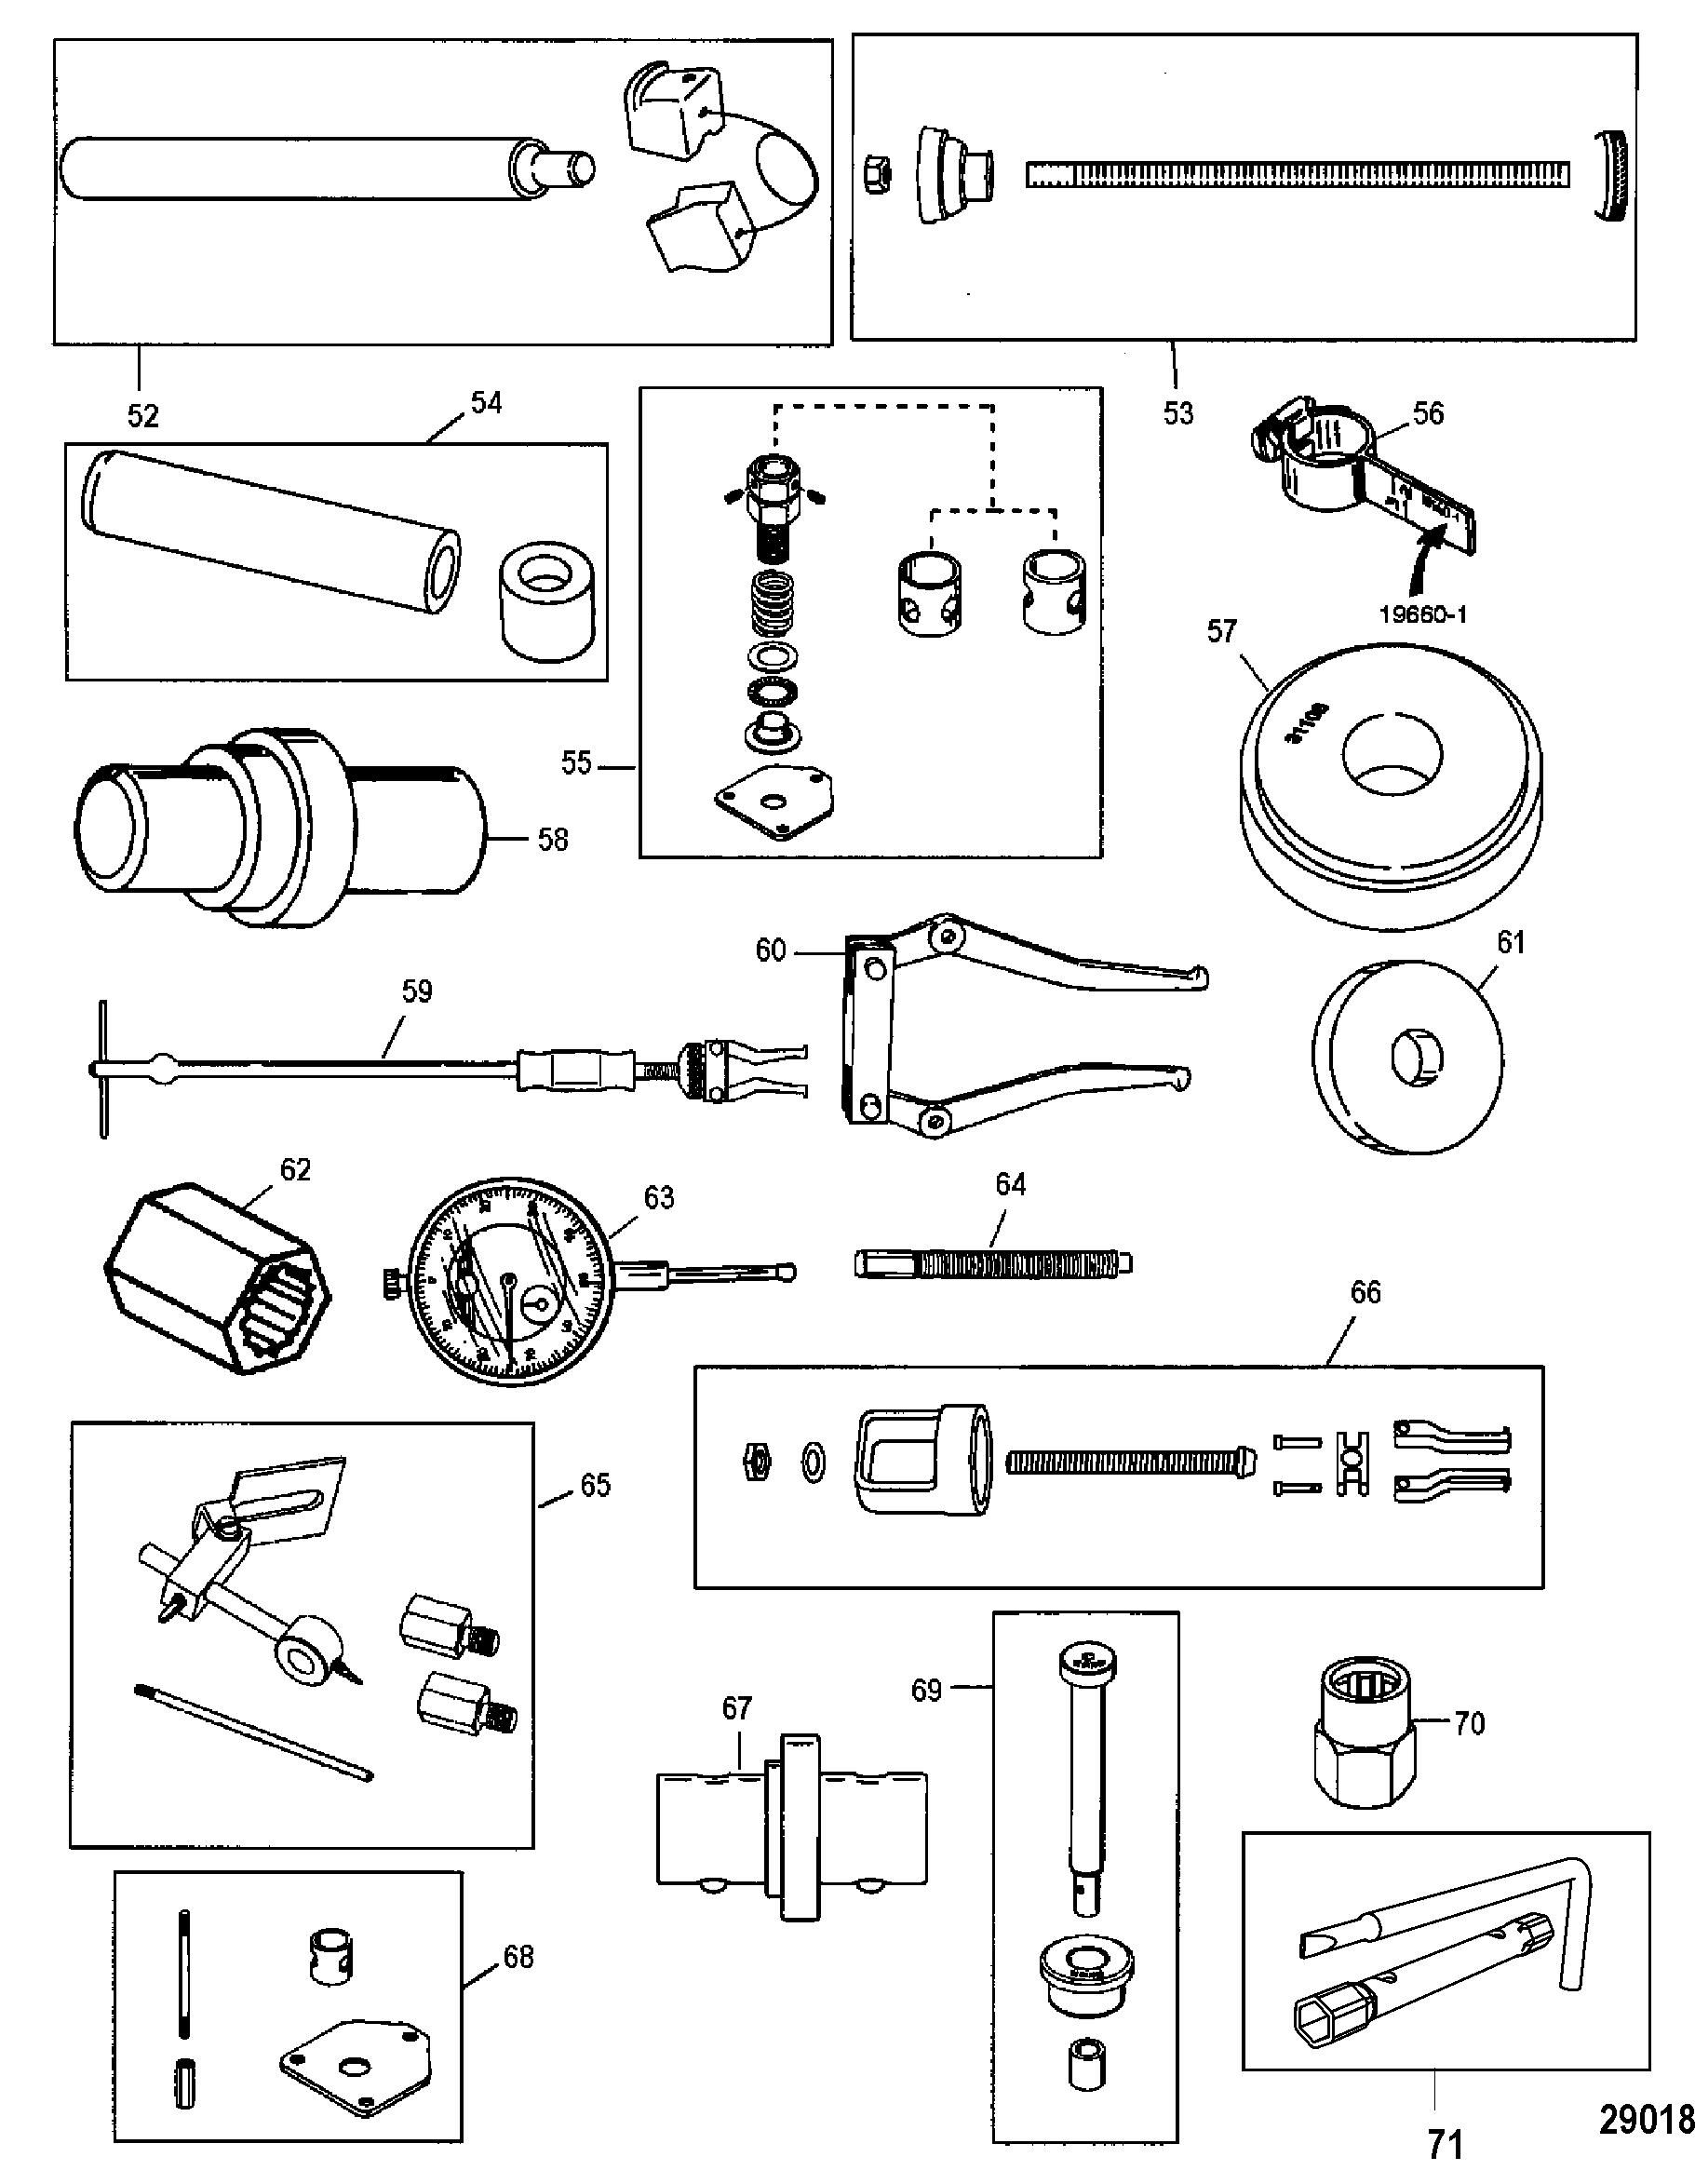 Tools 3 FOR MARINER / MERCURY 30/40 EFI 4-STROKE 3 CYLINDER